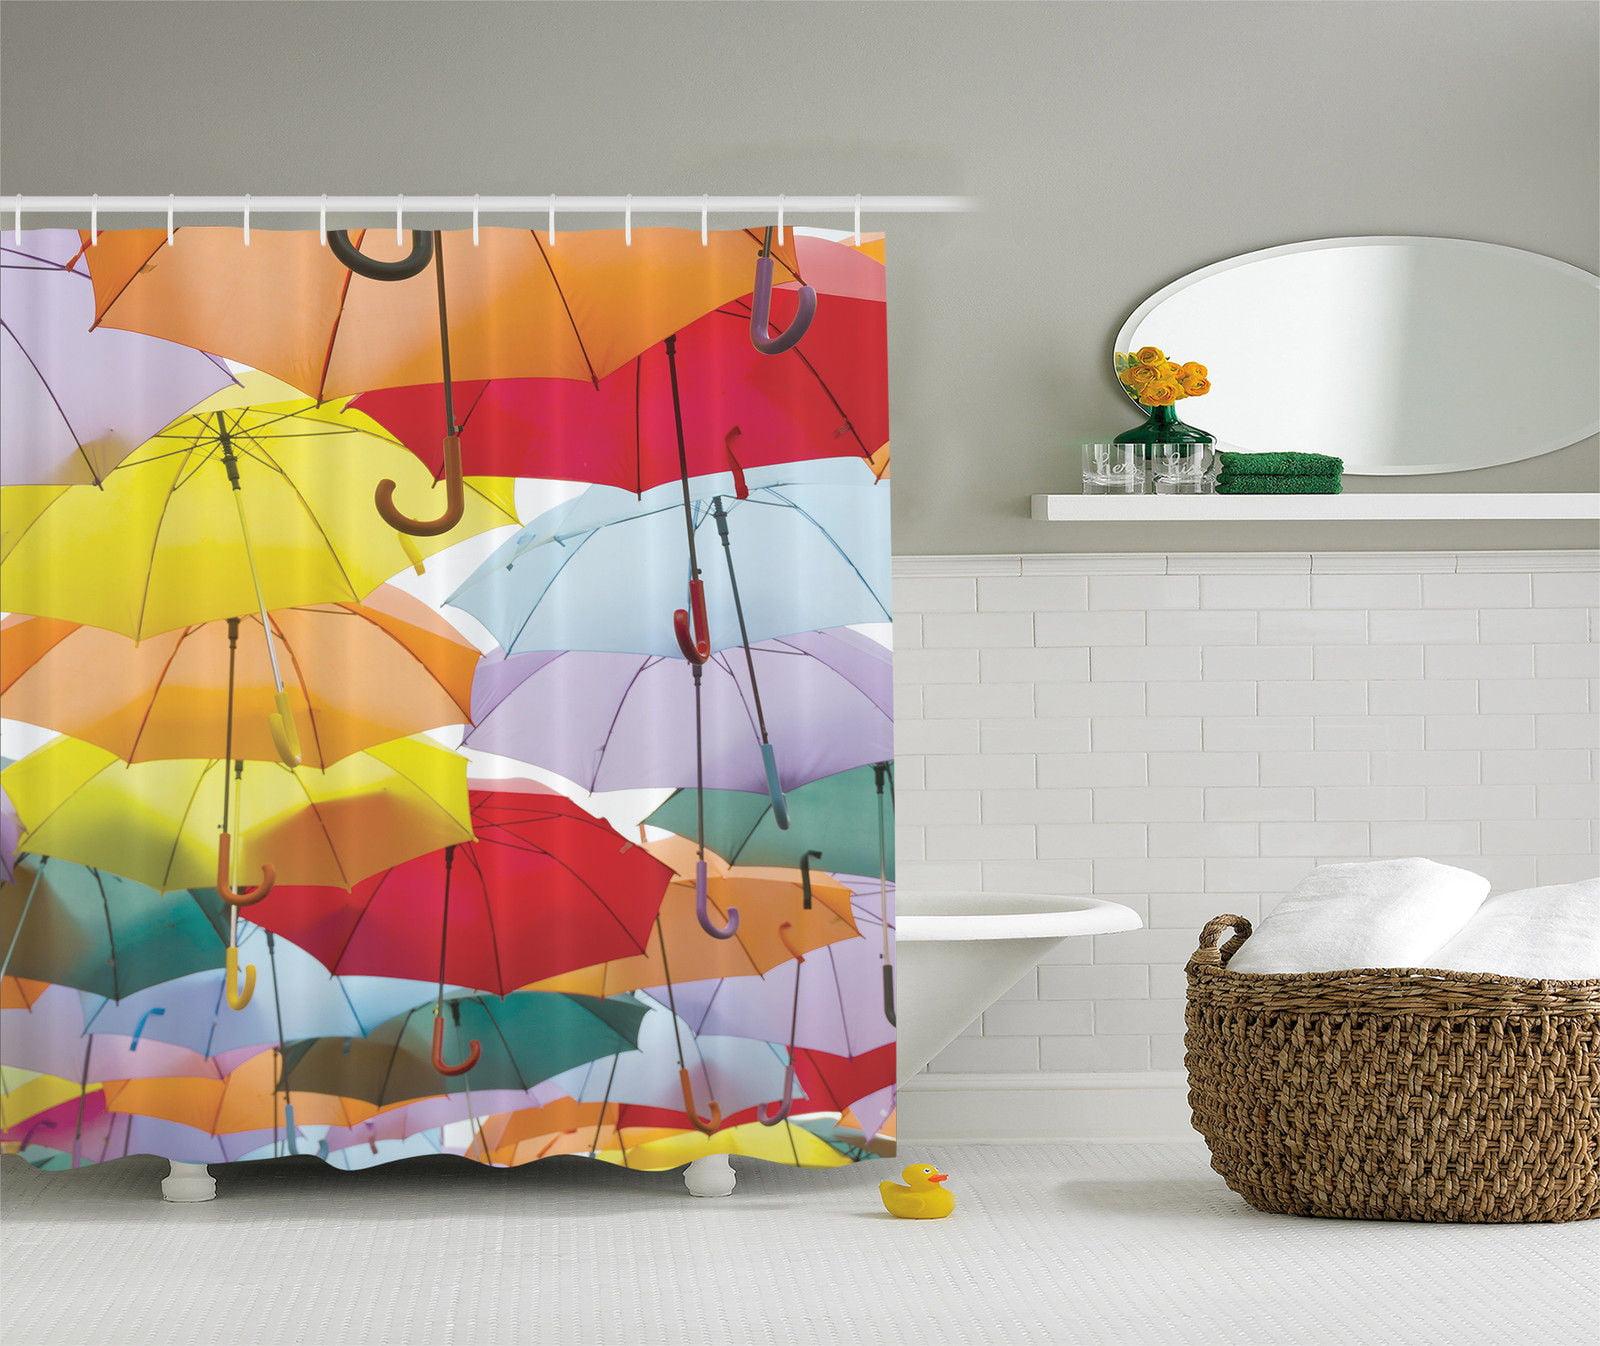 Waterproof Fabric Bathroom Liner Spanish Vintage Street Shower Curtain Set Mat